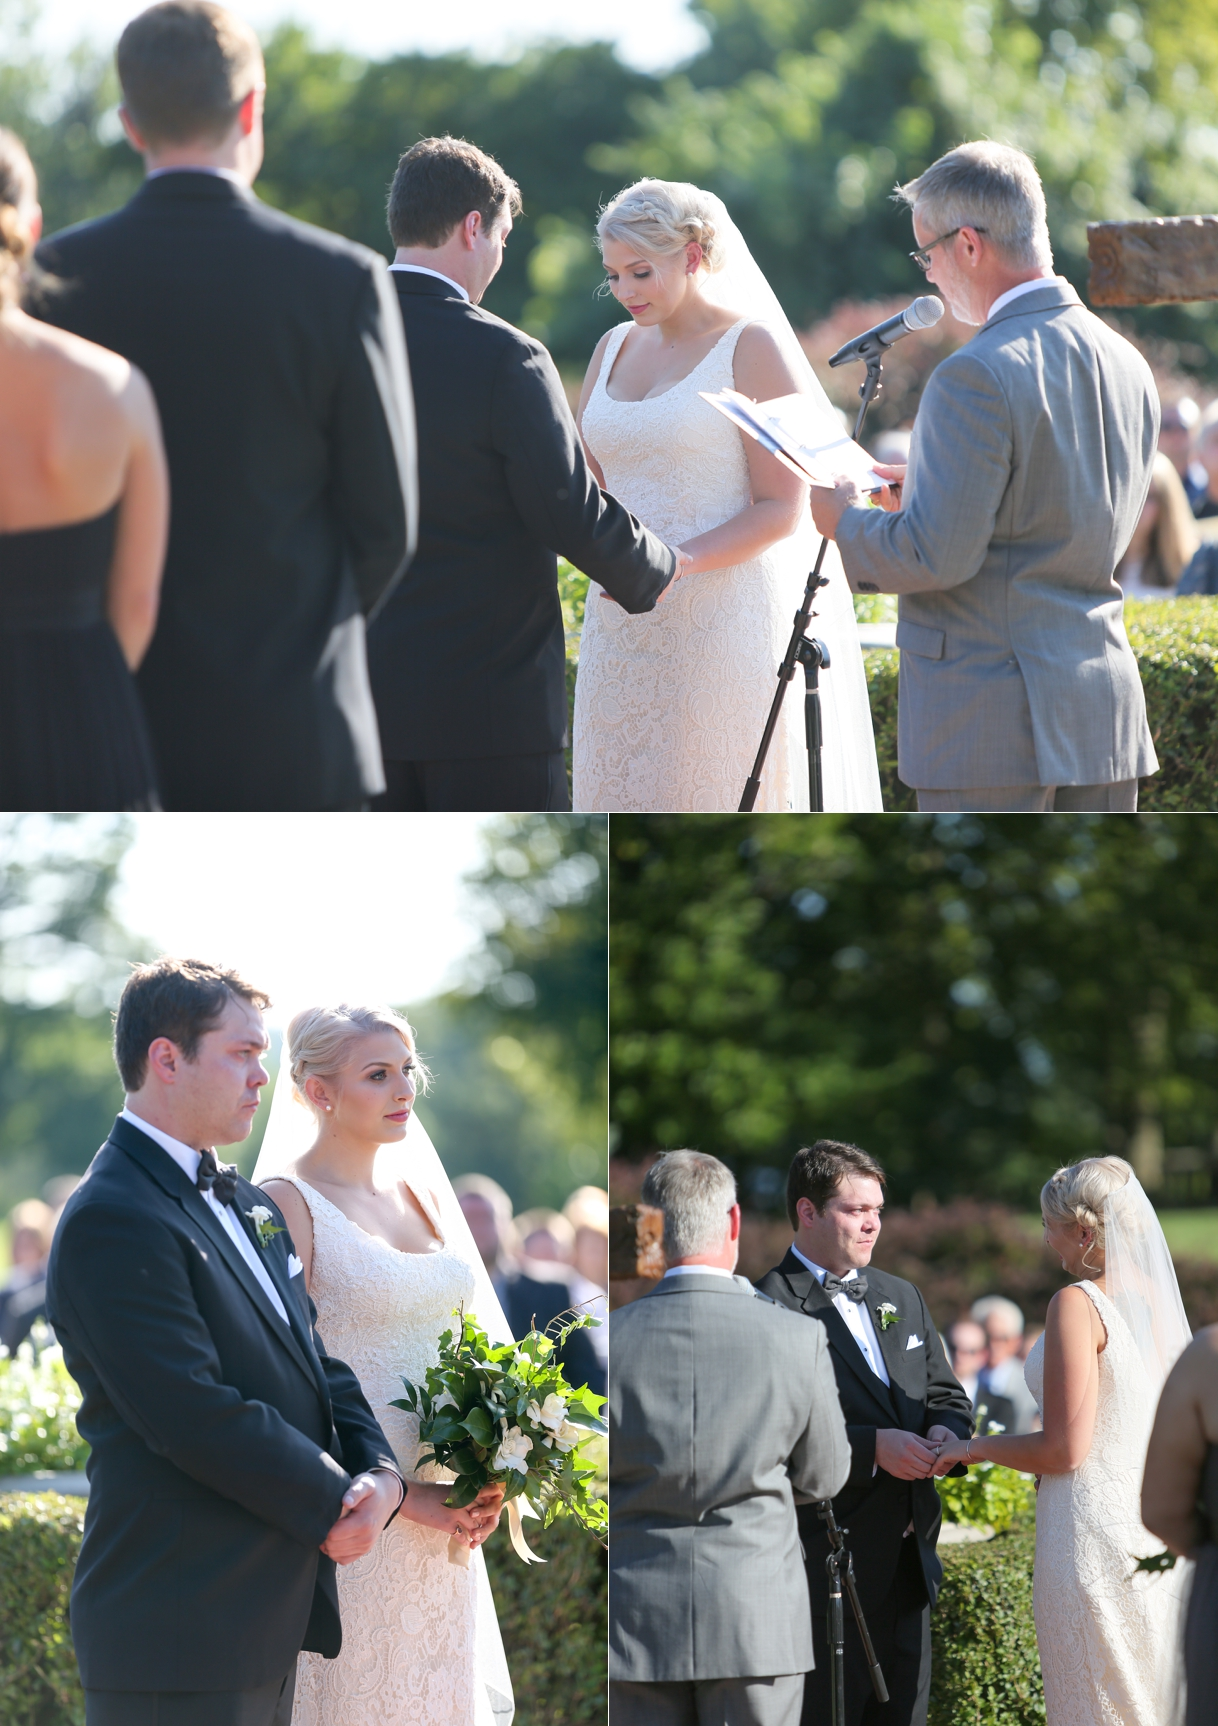 audreysnow-photography-kansas-city-wedding-photographer-longview-mansion_4037.jpg